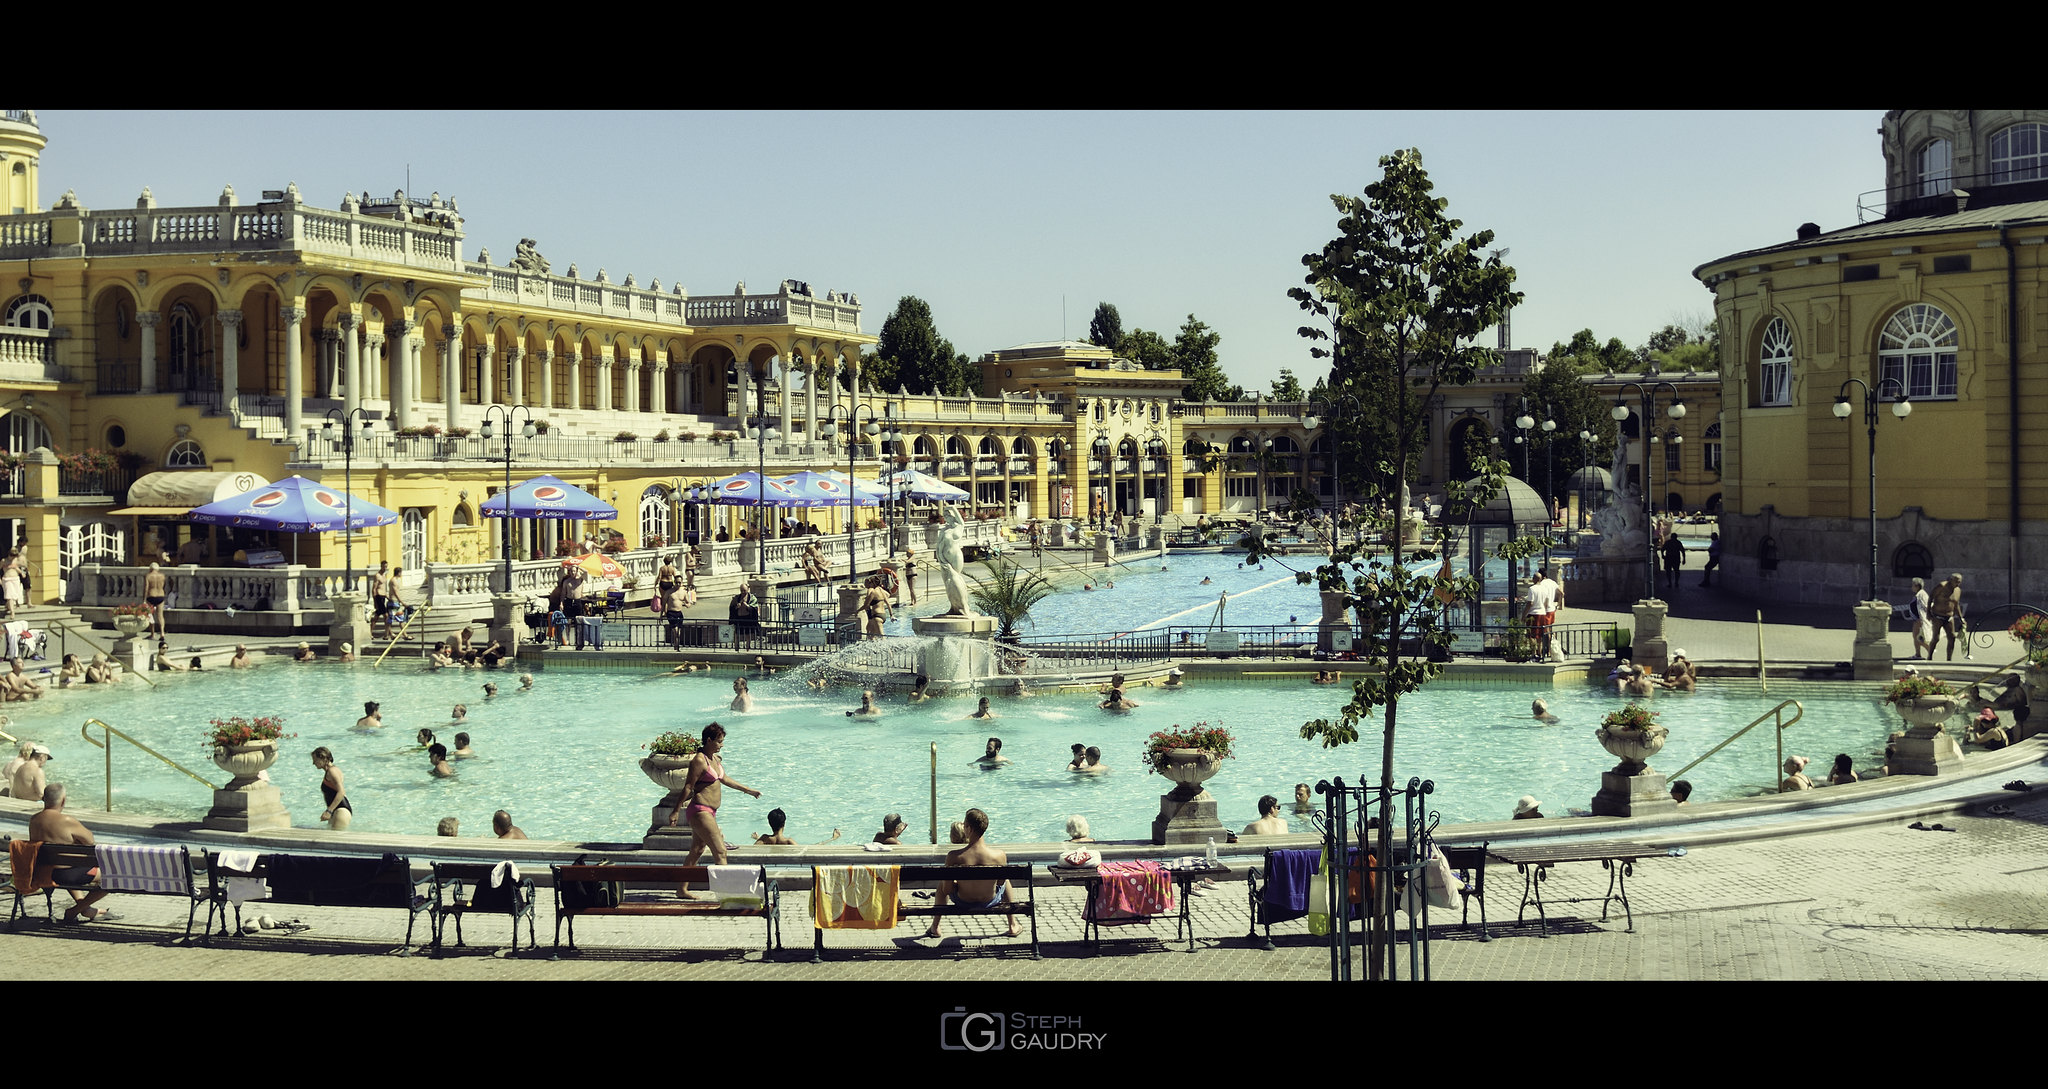 Széchenyi Thermal Bath and Swimming Pool [Klik om de diavoorstelling te starten]